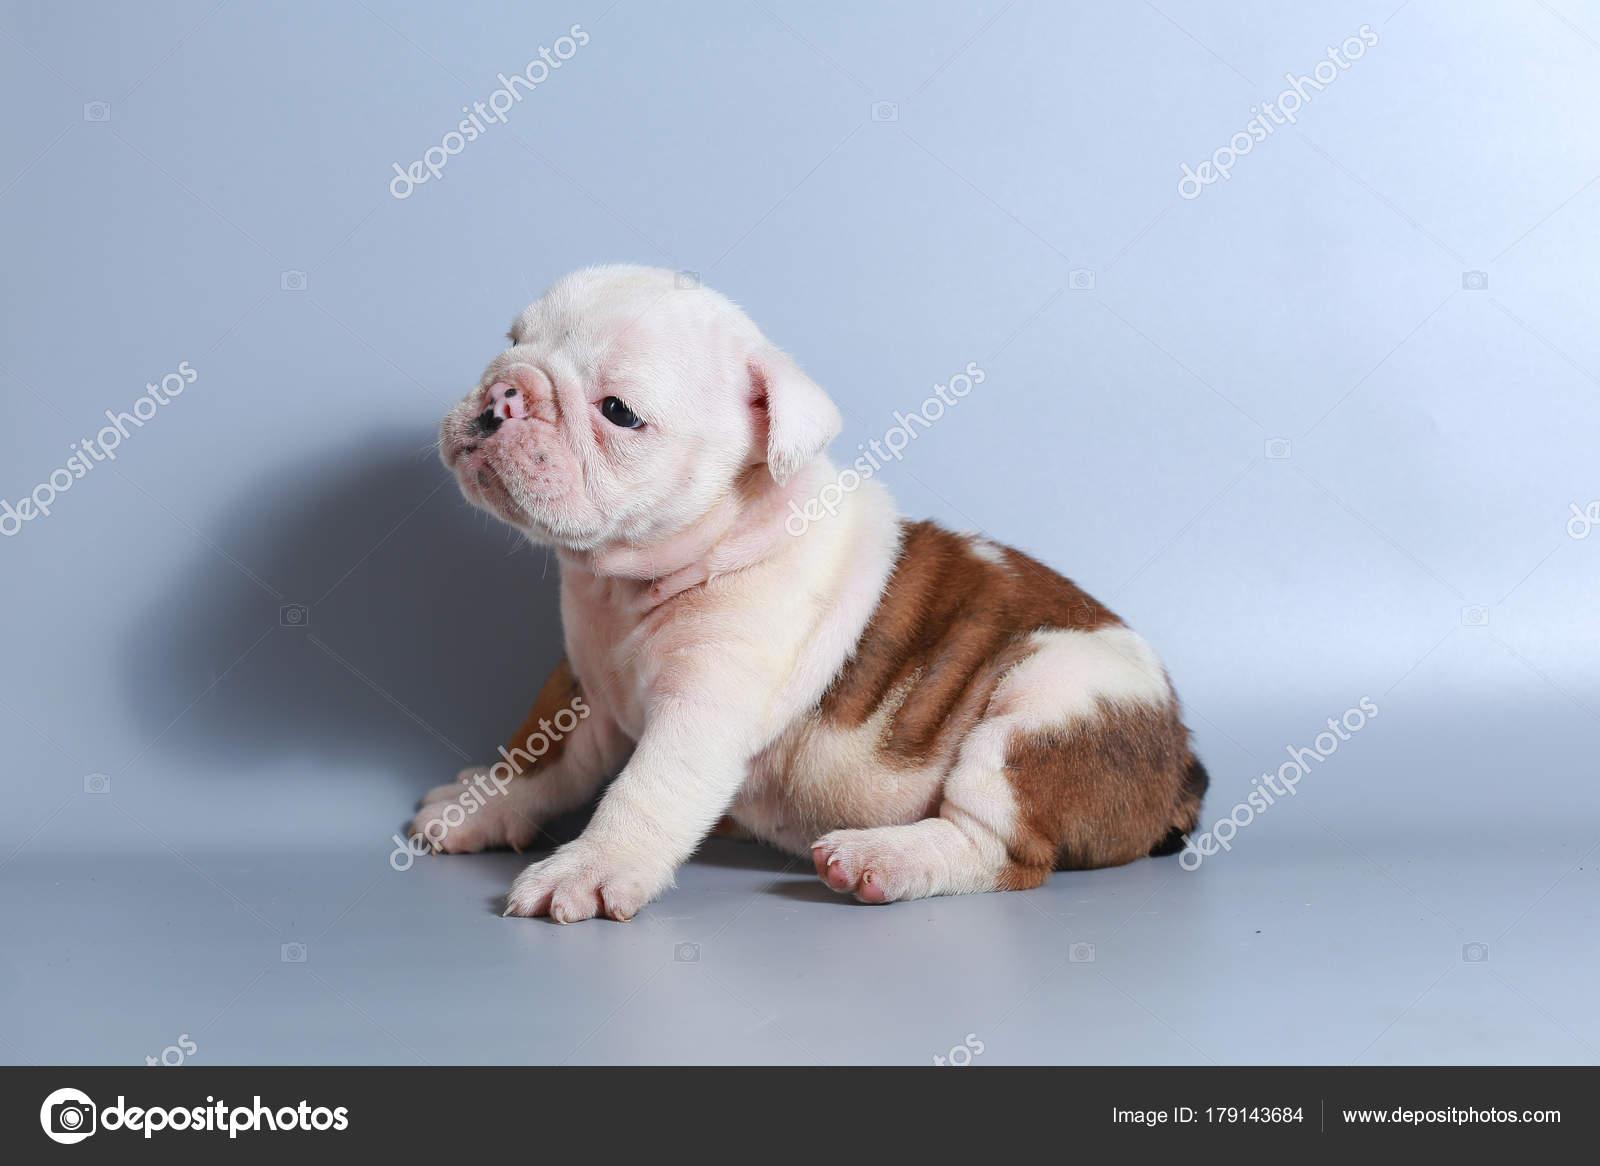 Month Purebred English Bulldog Puppy Gray Screen Stock Photo C S Thanawathreborn Gmail Com 179143684